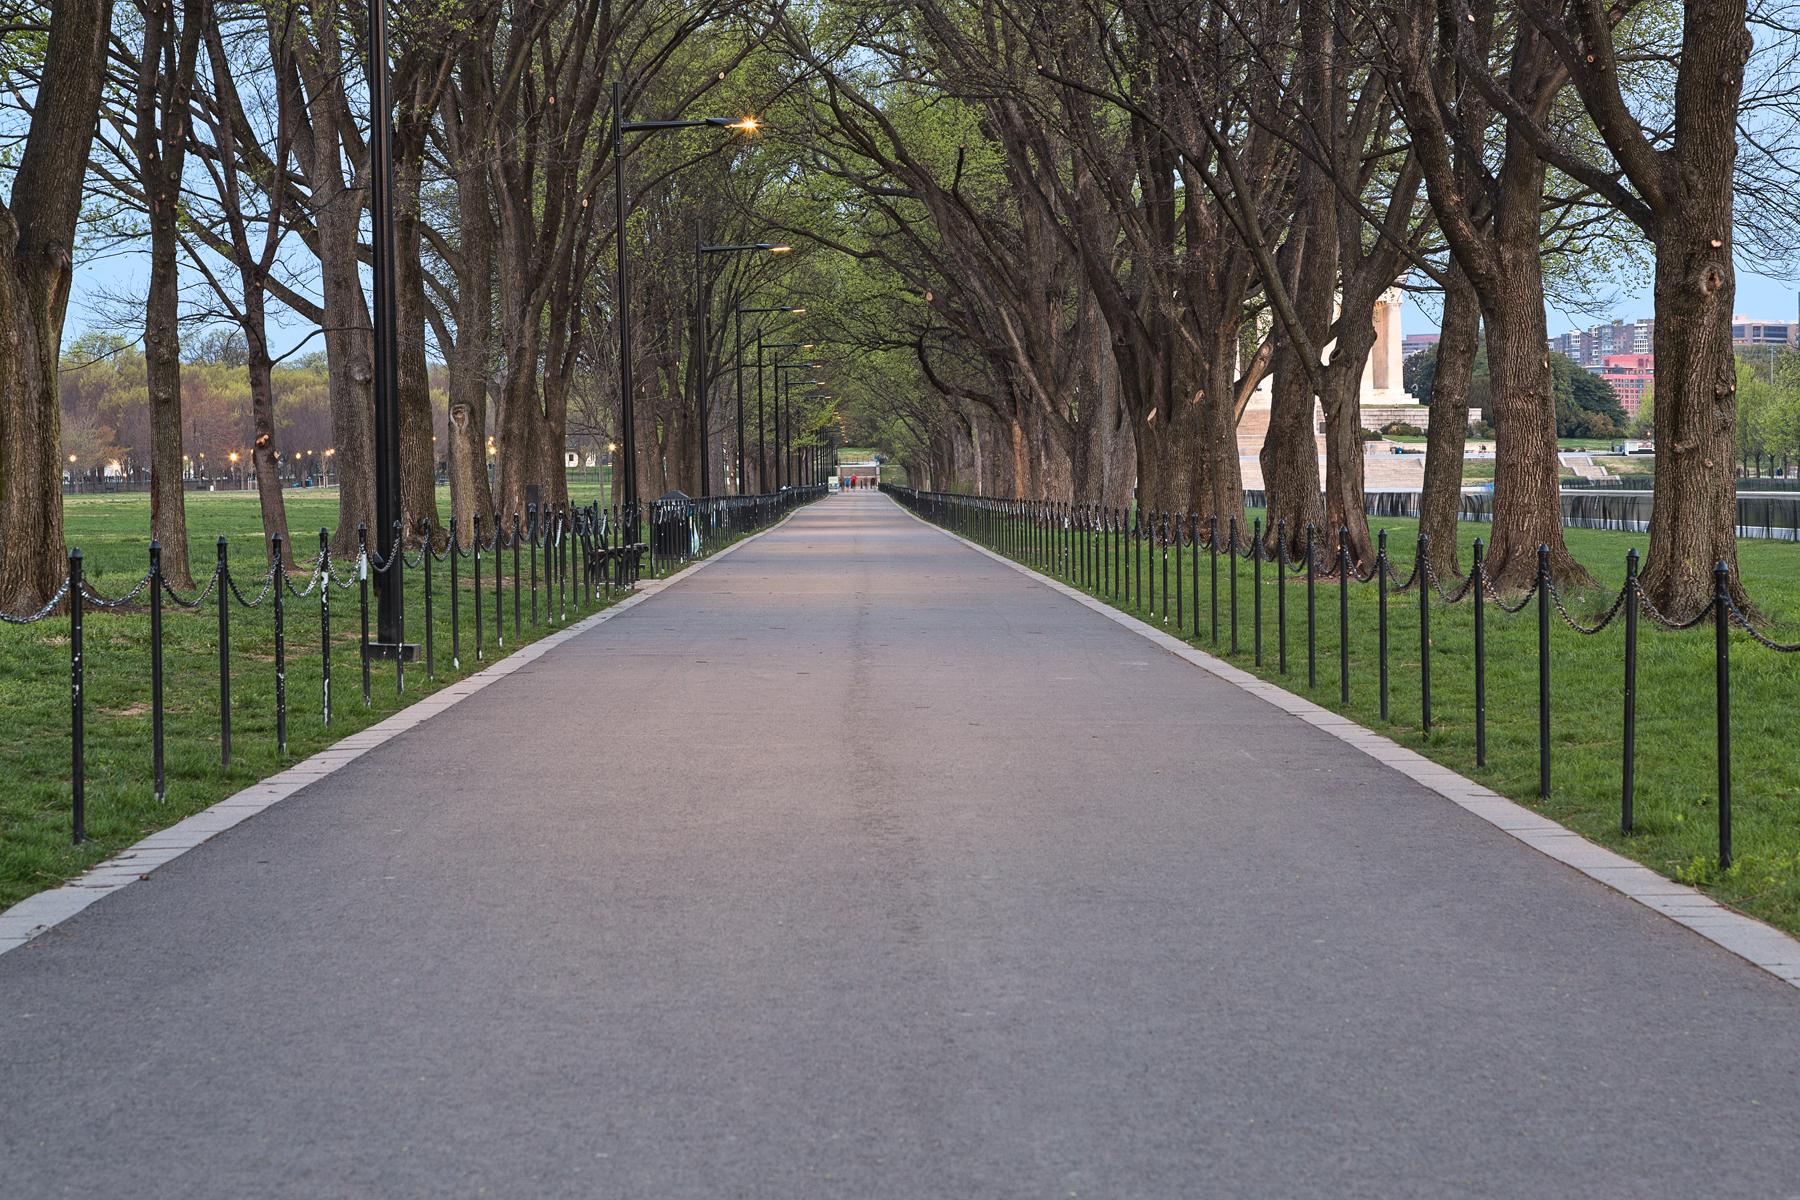 National Mall Promenade - HDR, America, Railings, Sepia, Seasonal, HQ Photo